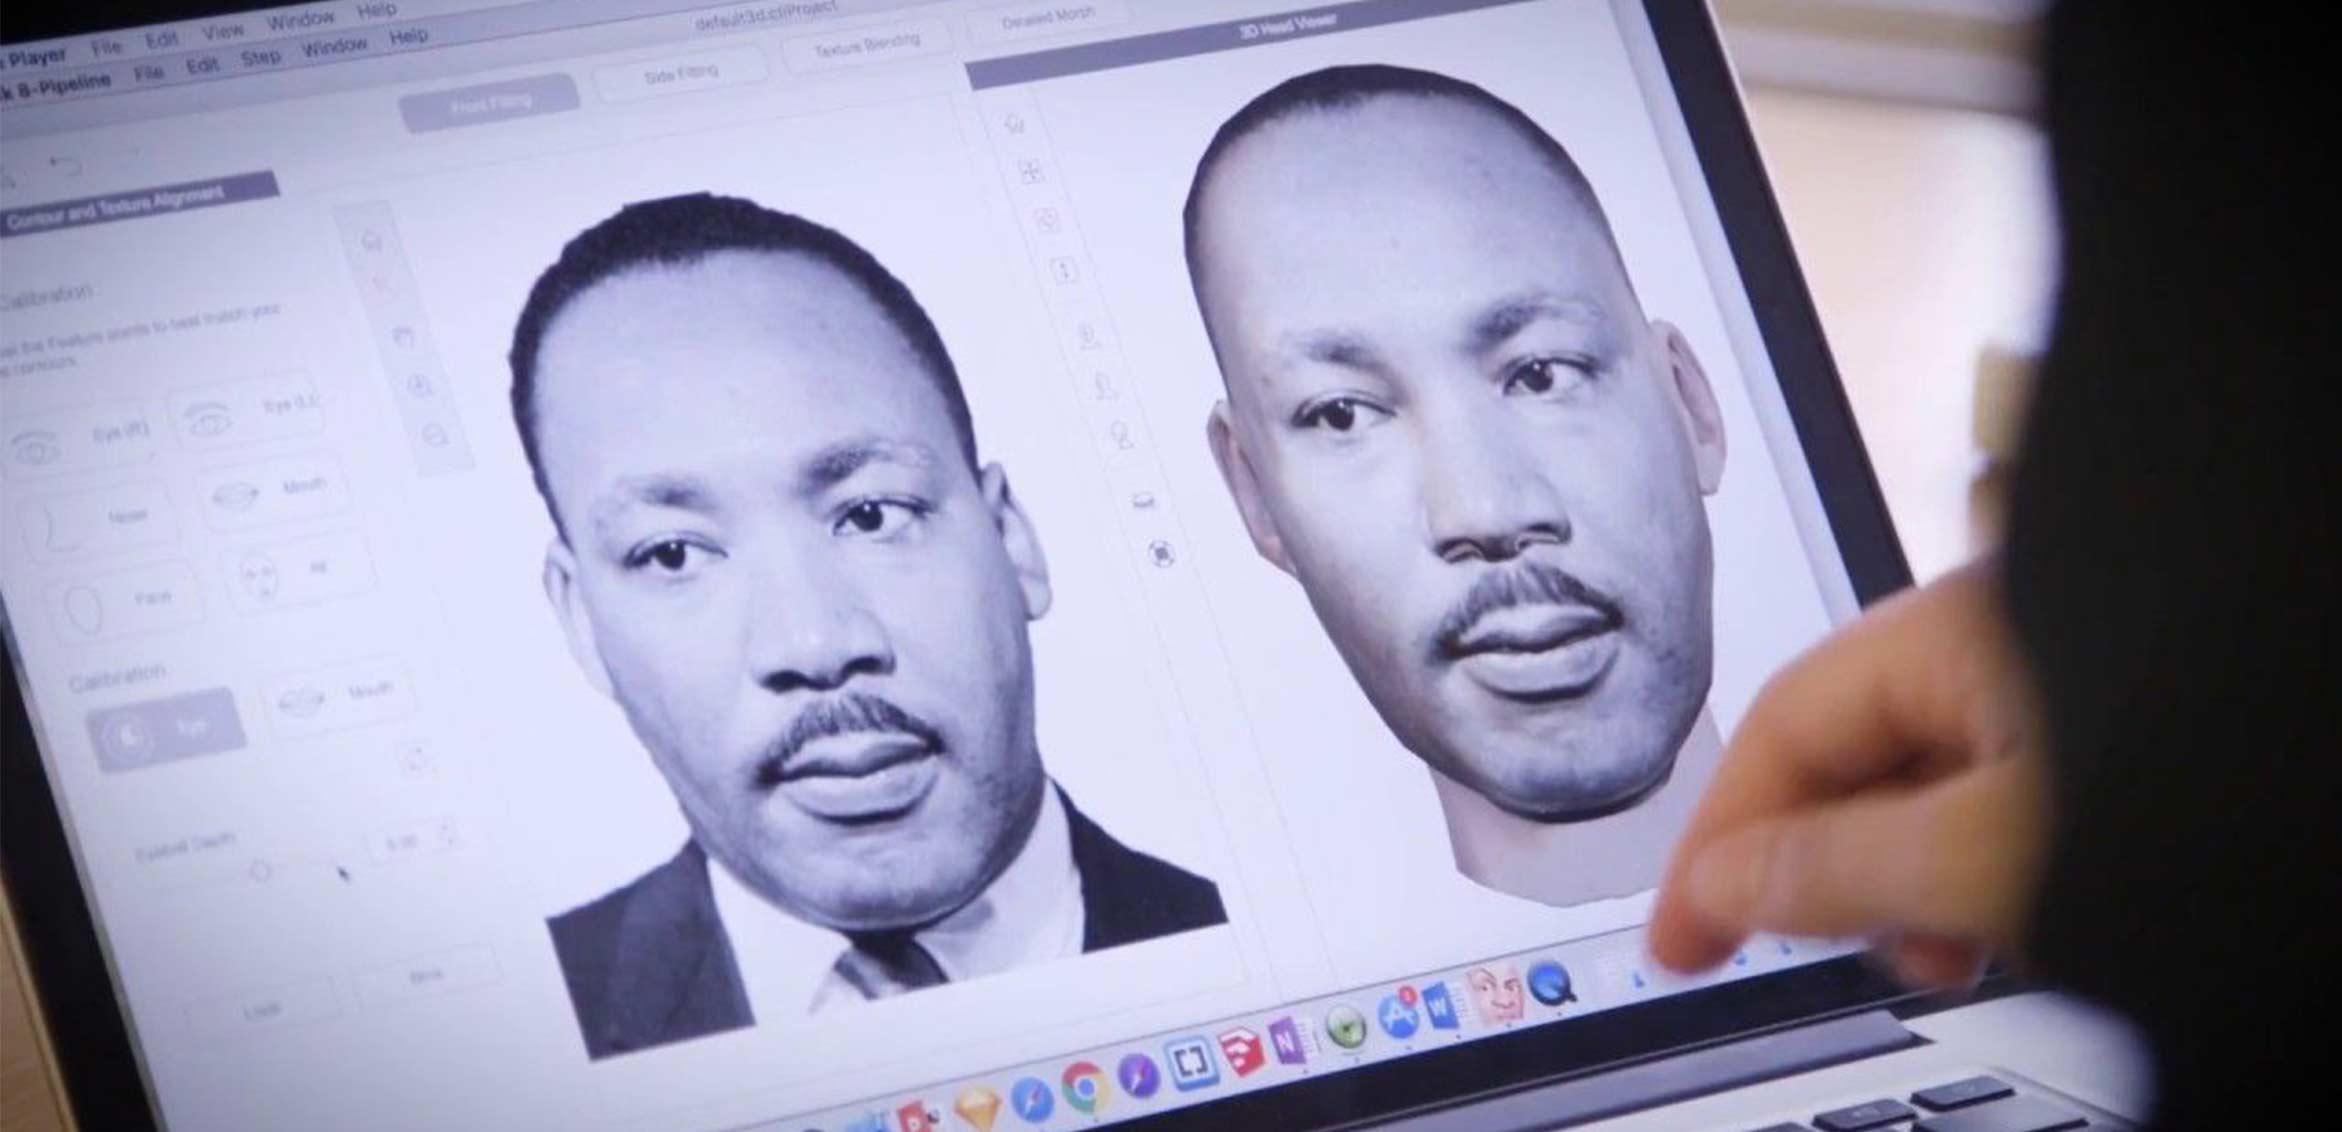 Development of MLK 3D model on computer